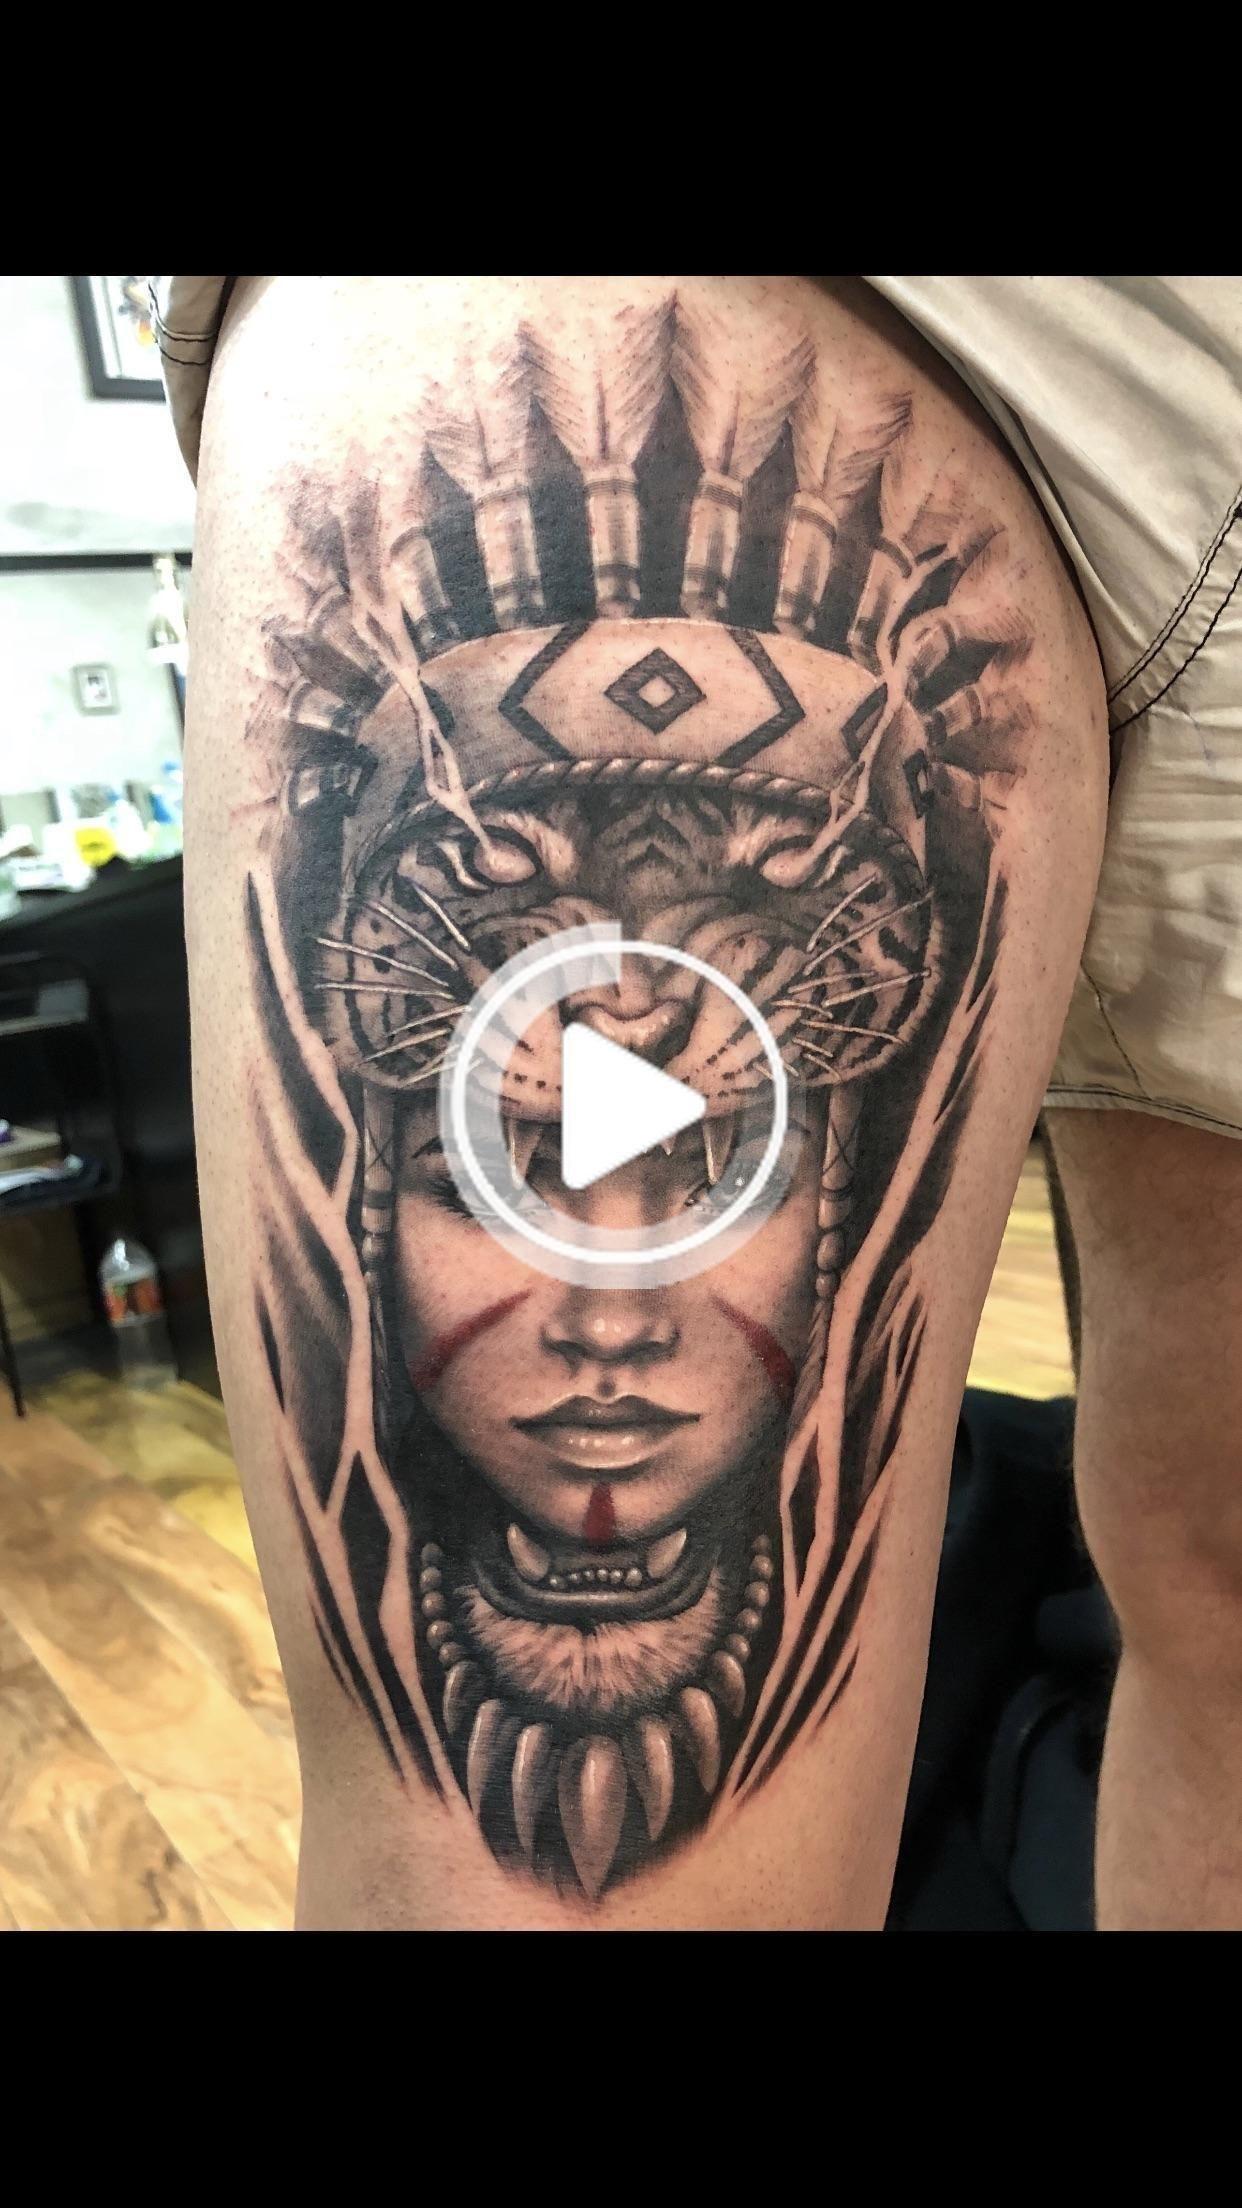 Iain mclellan revere in 2020 tattoos nature tattoos